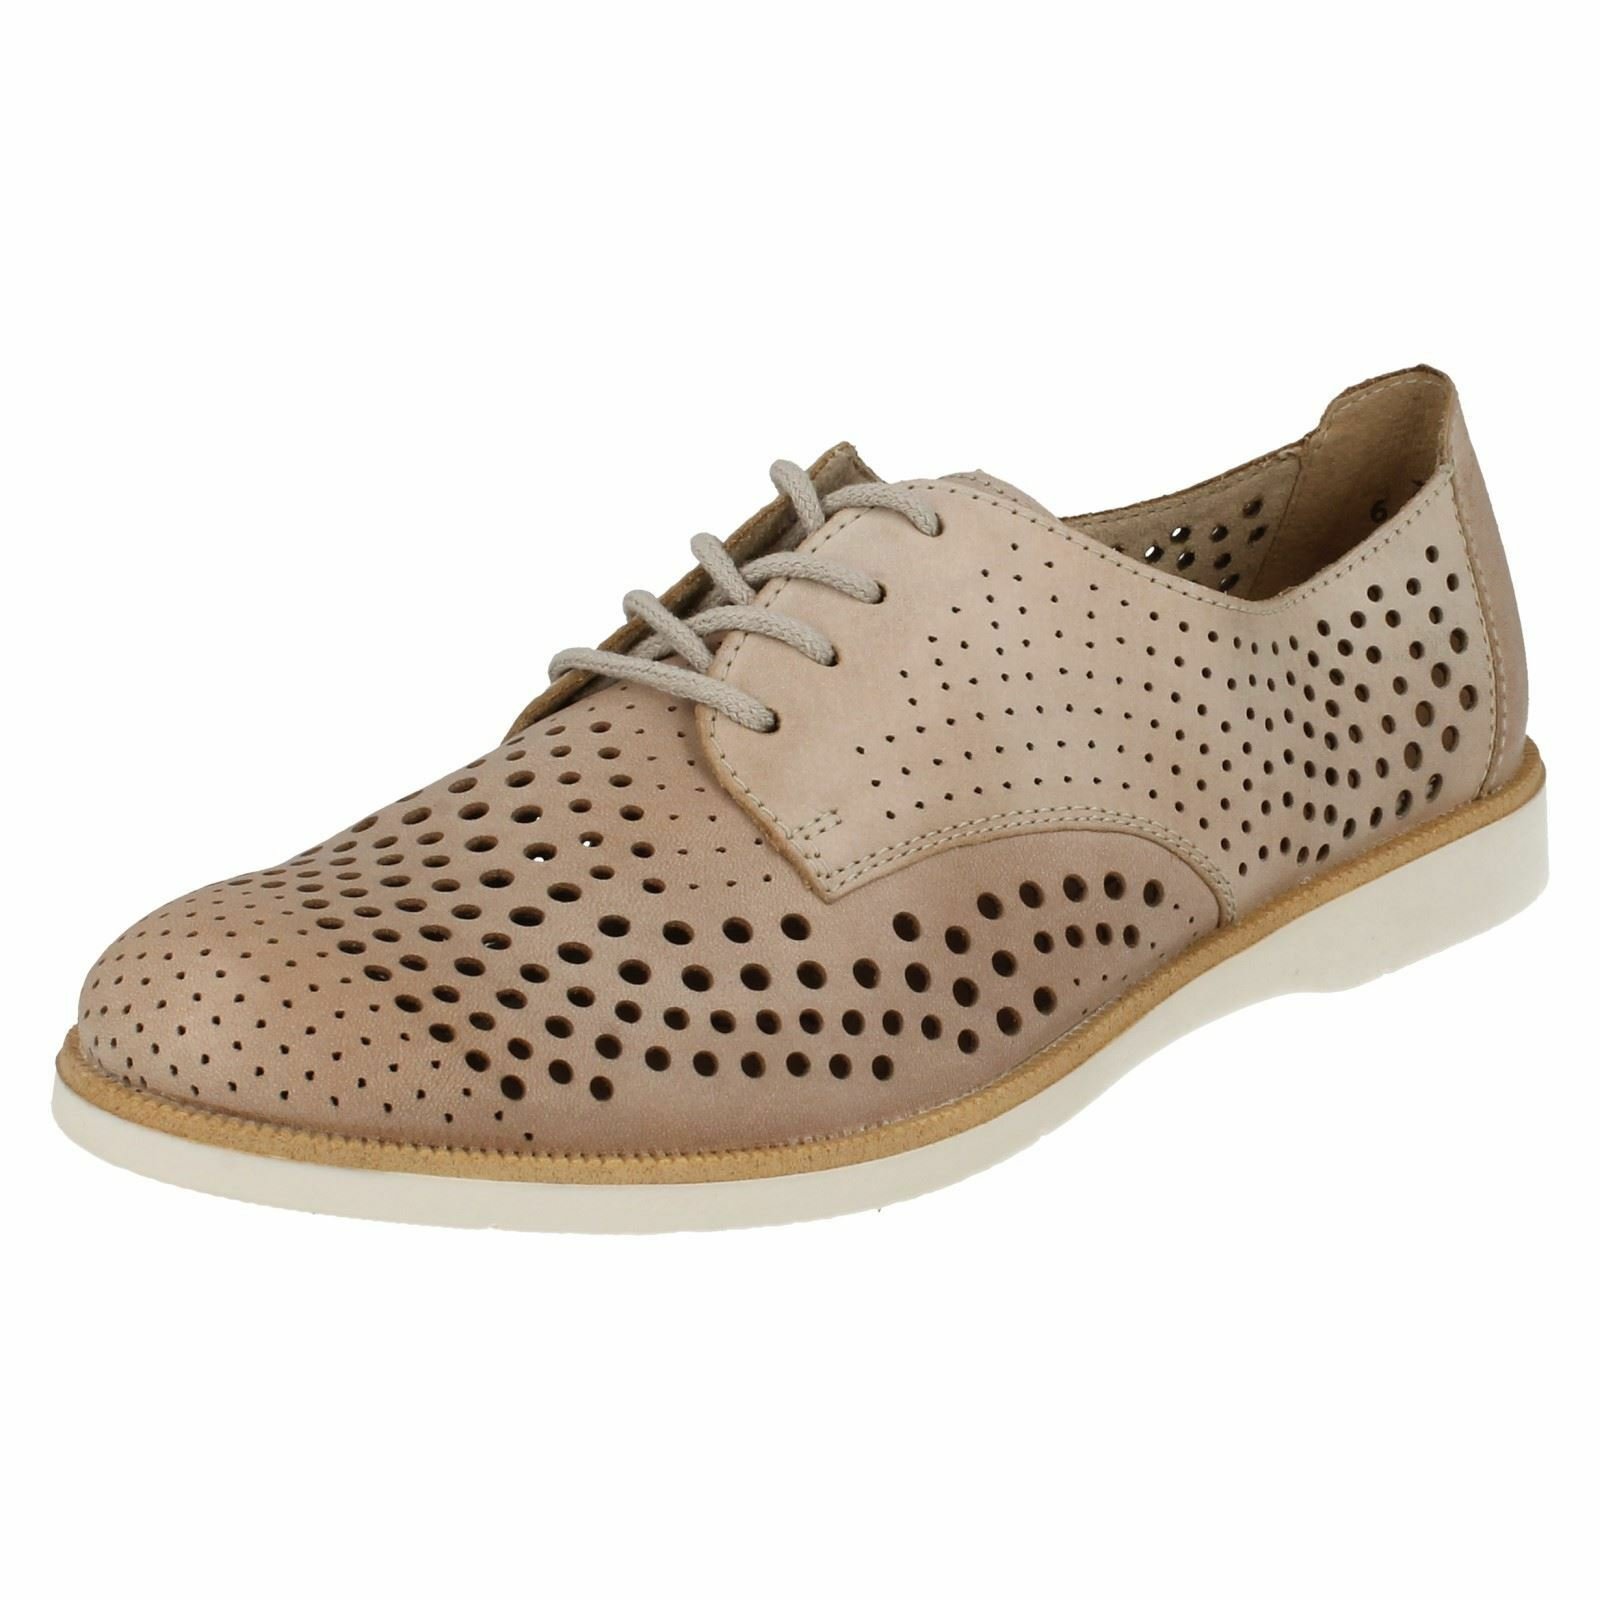 Ladies Remonte Smart Casual Lace Up shoes - R0403